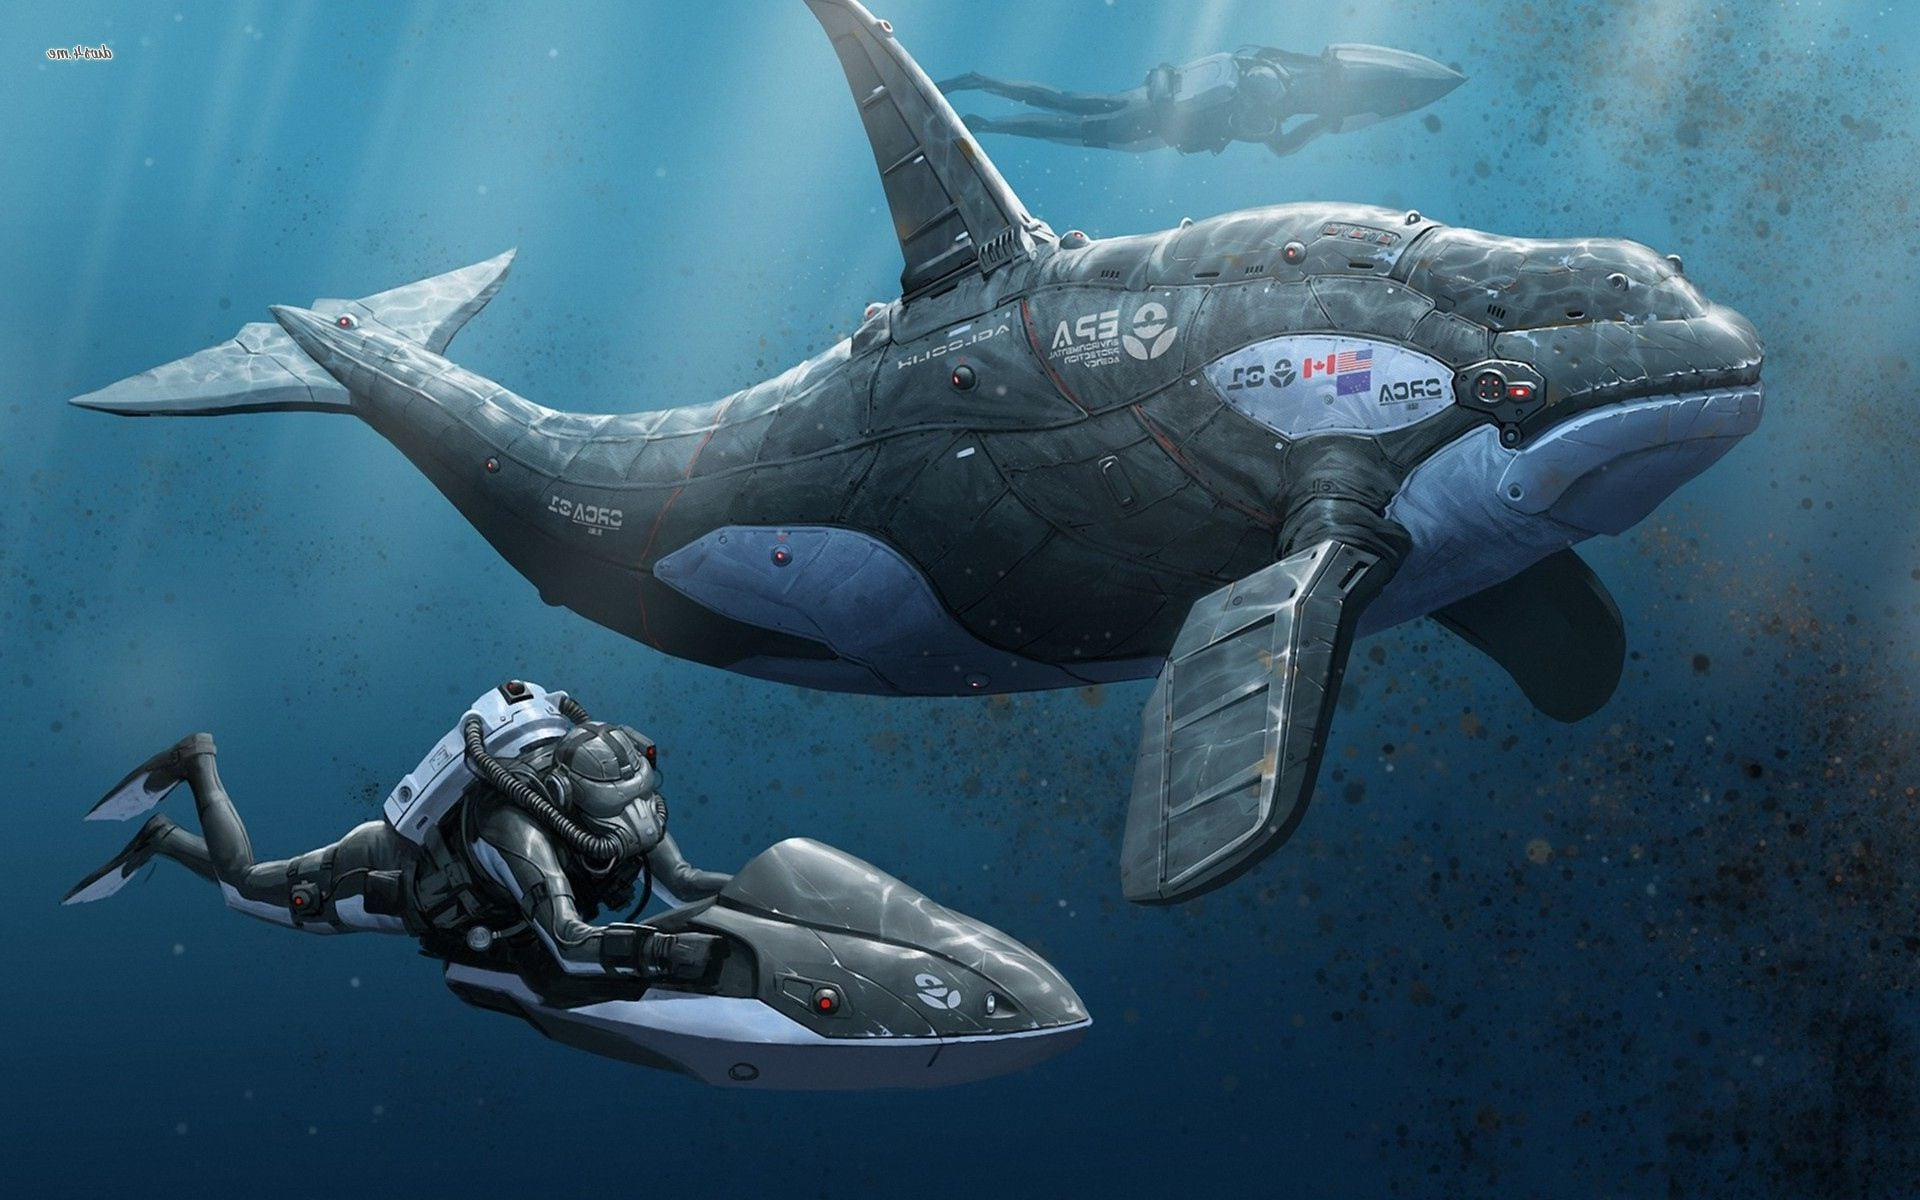 Drawn wallpaper whale Killer art HD Killer wallpaper